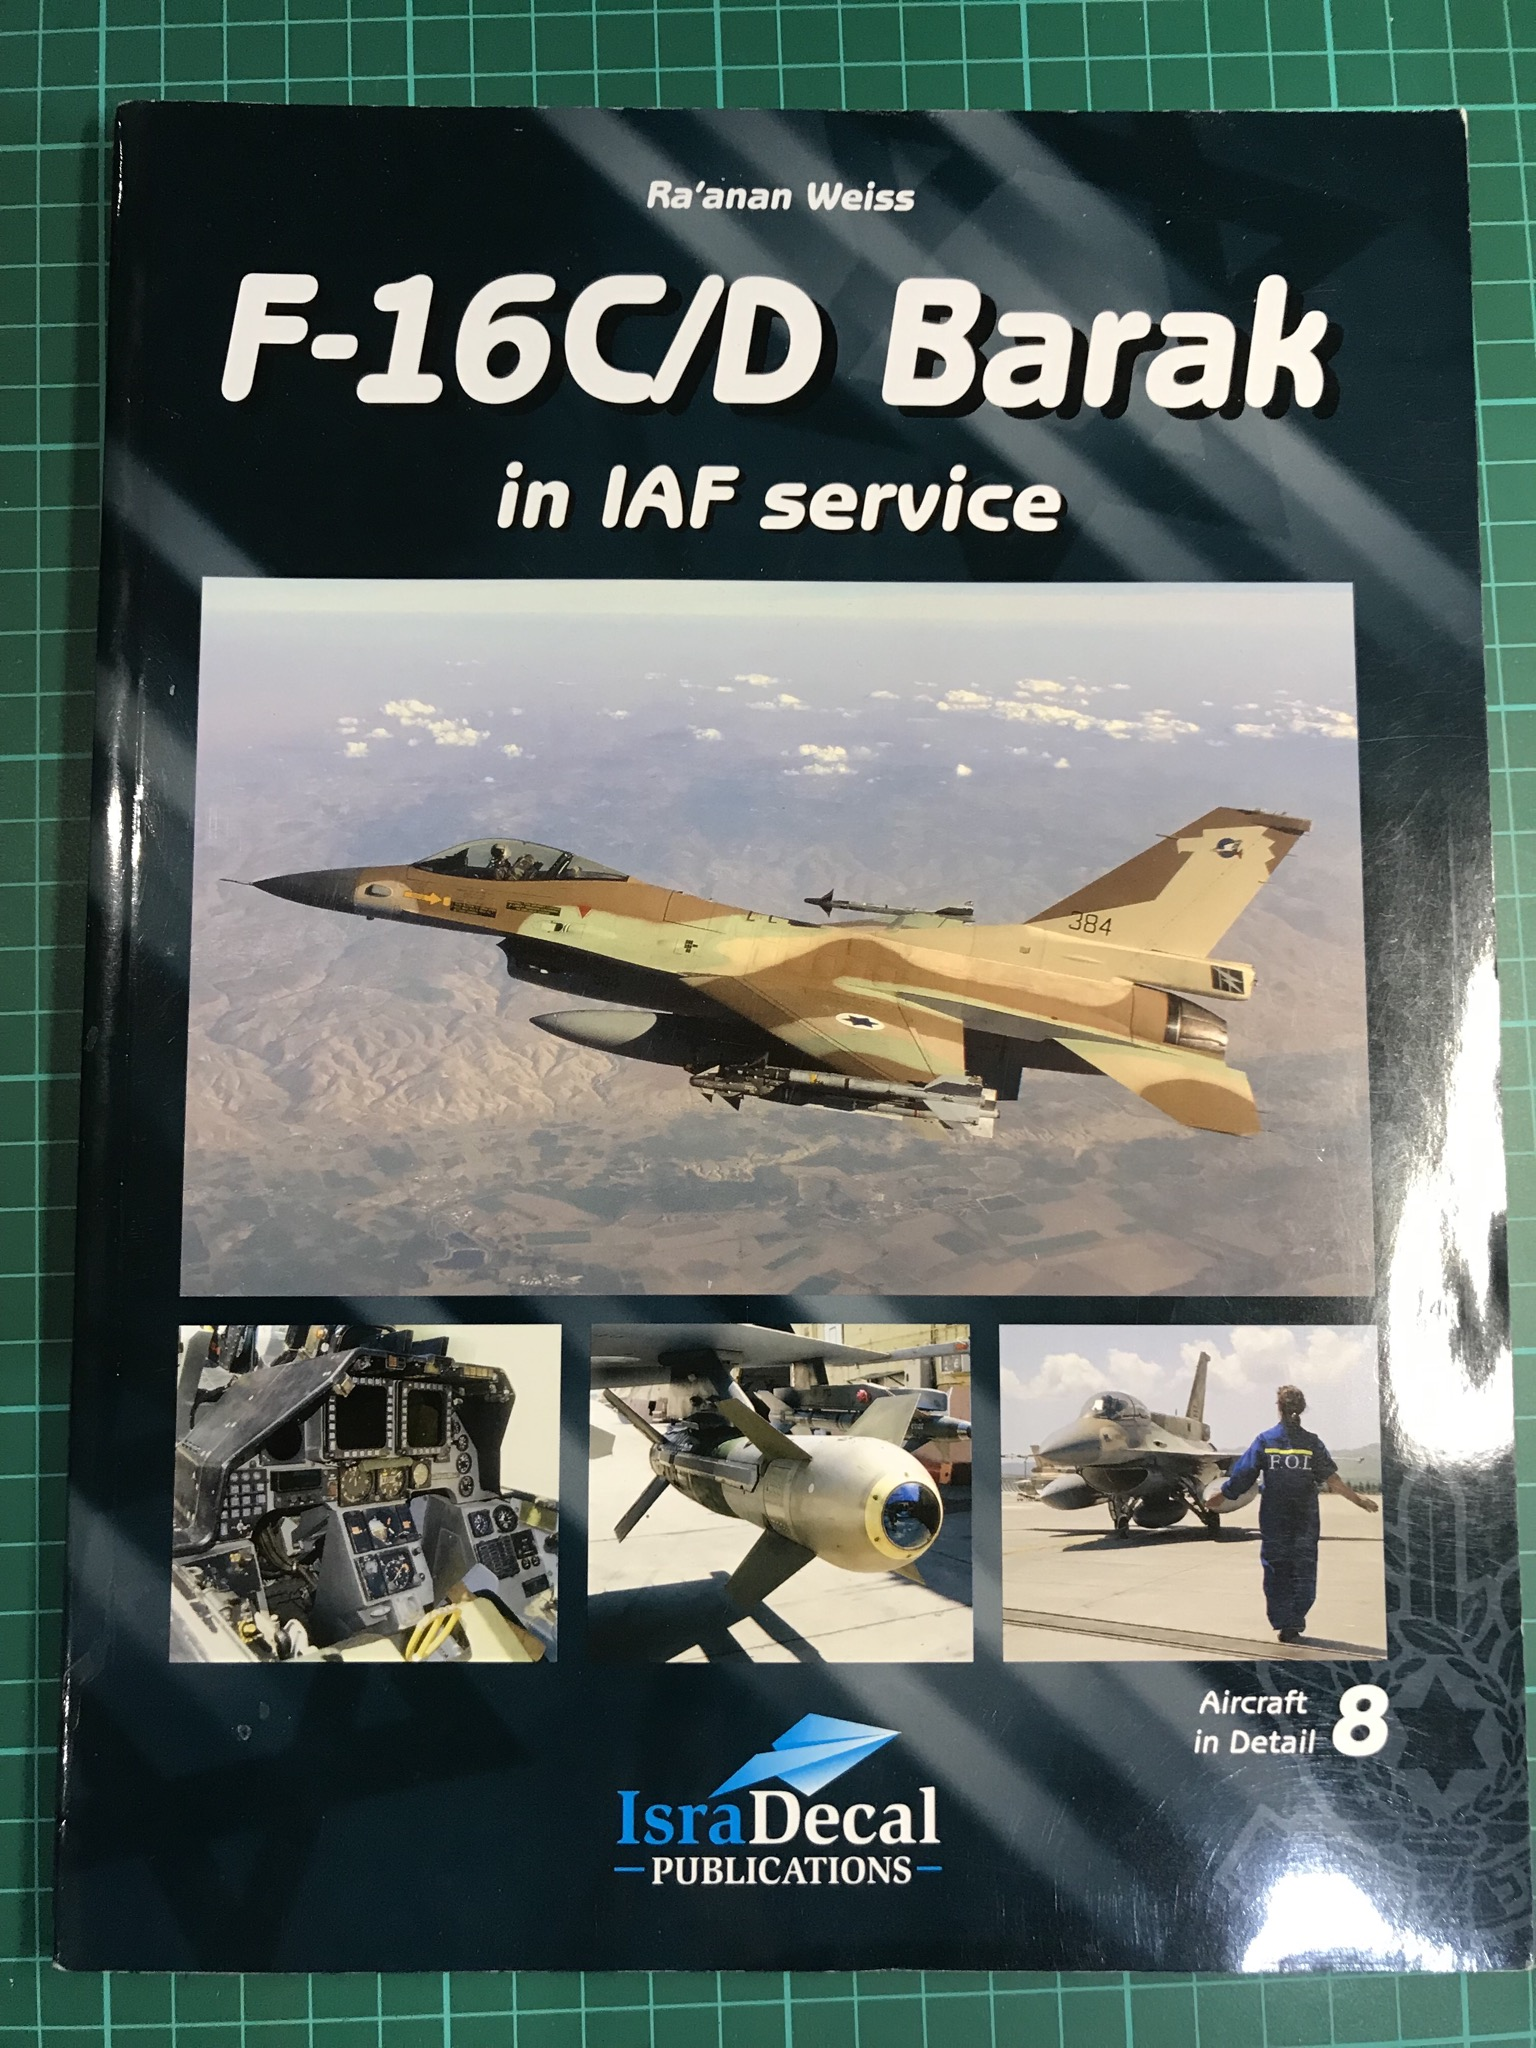 392BC3E7-77C3-4D02-81AA-FD3008DAE3F9.jpeg